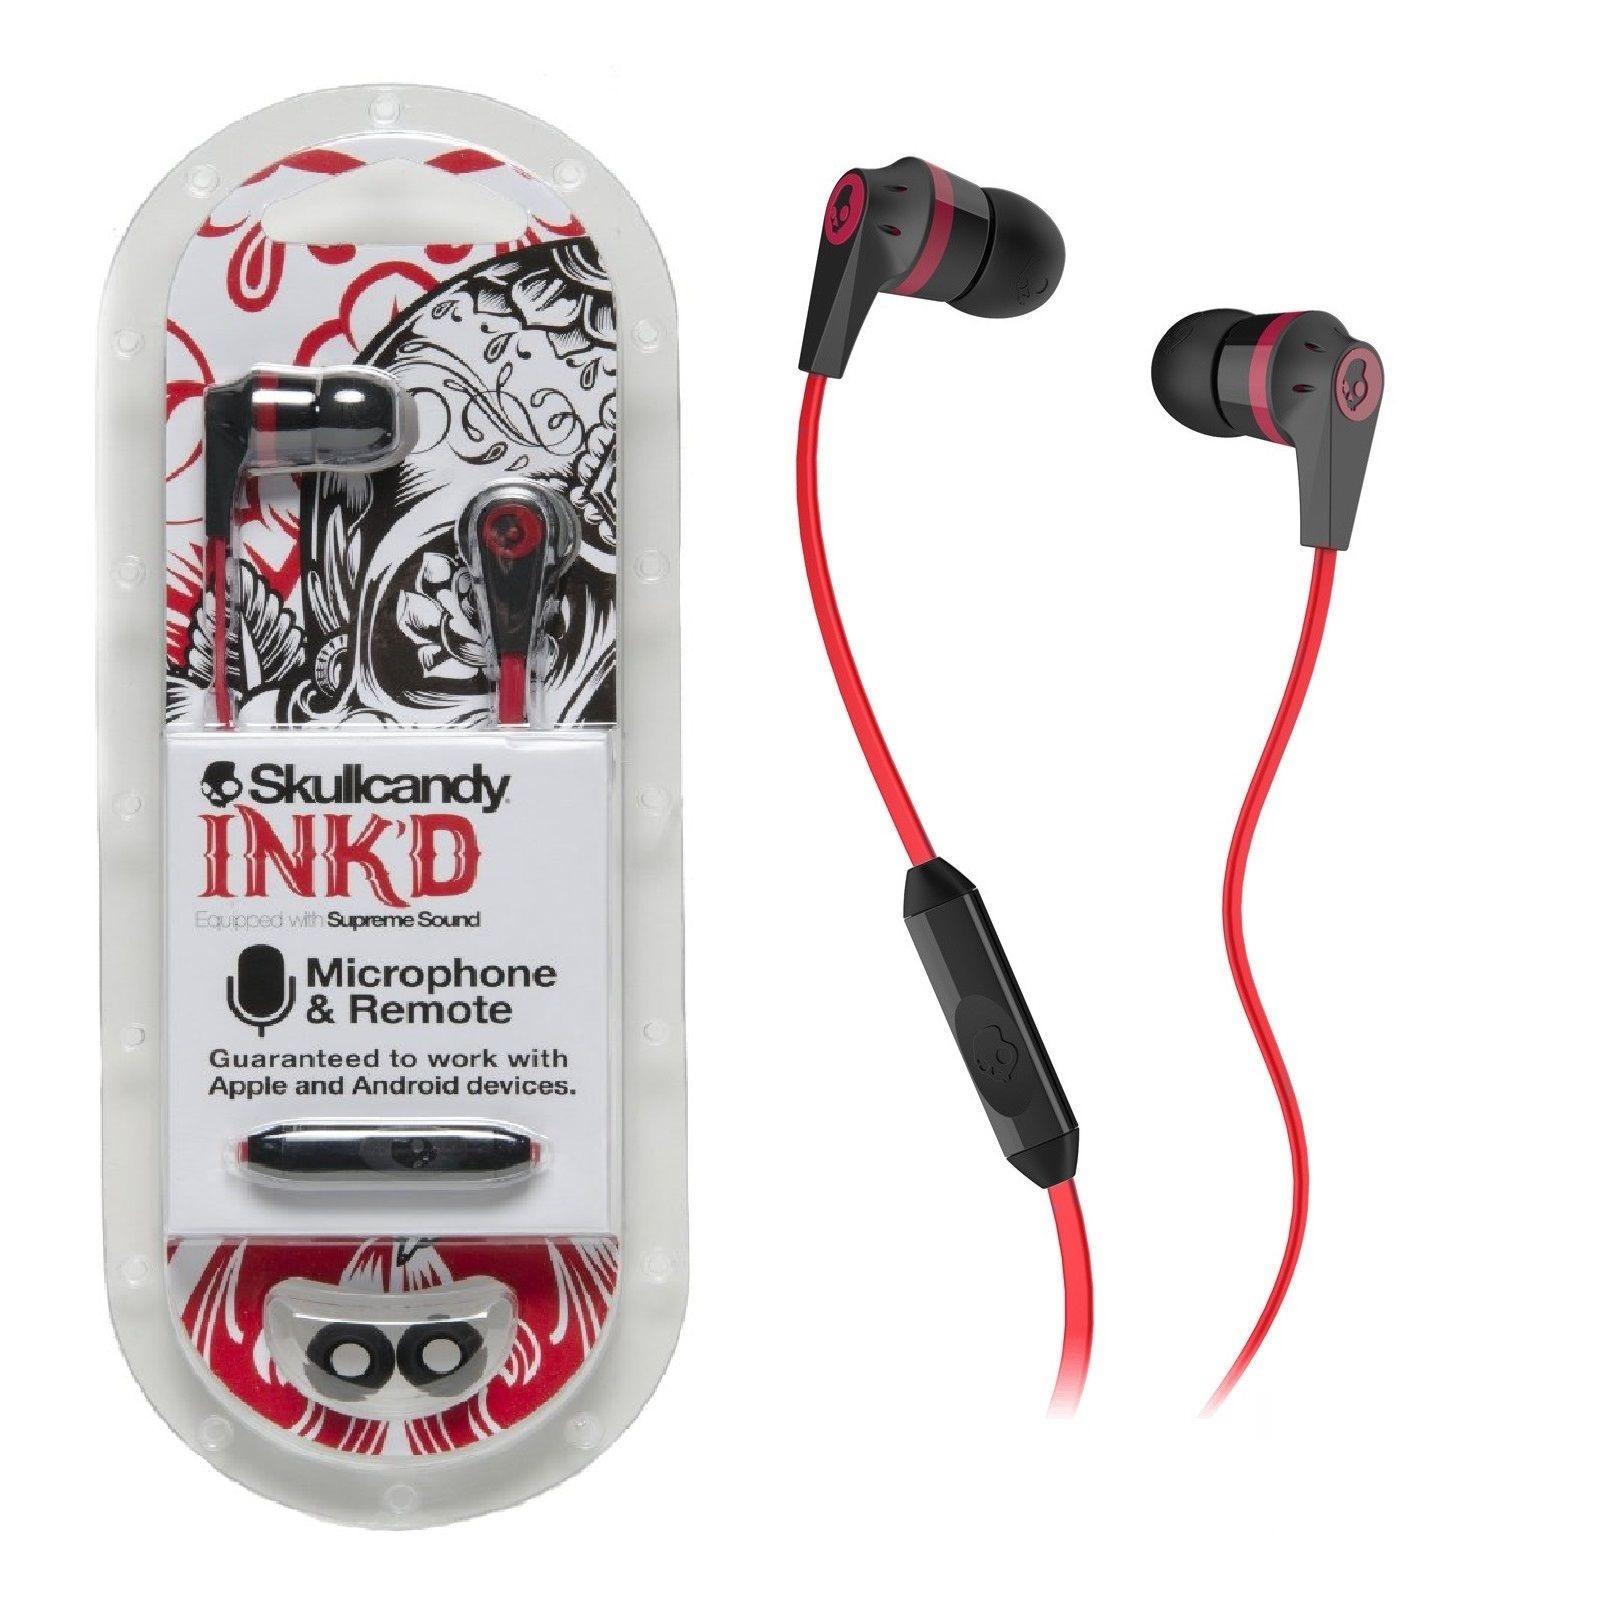 Skullcandy red / Black S2IKDY-010 3.5mm Connector Ink'd 2.0 Earbud Headphones with Mic